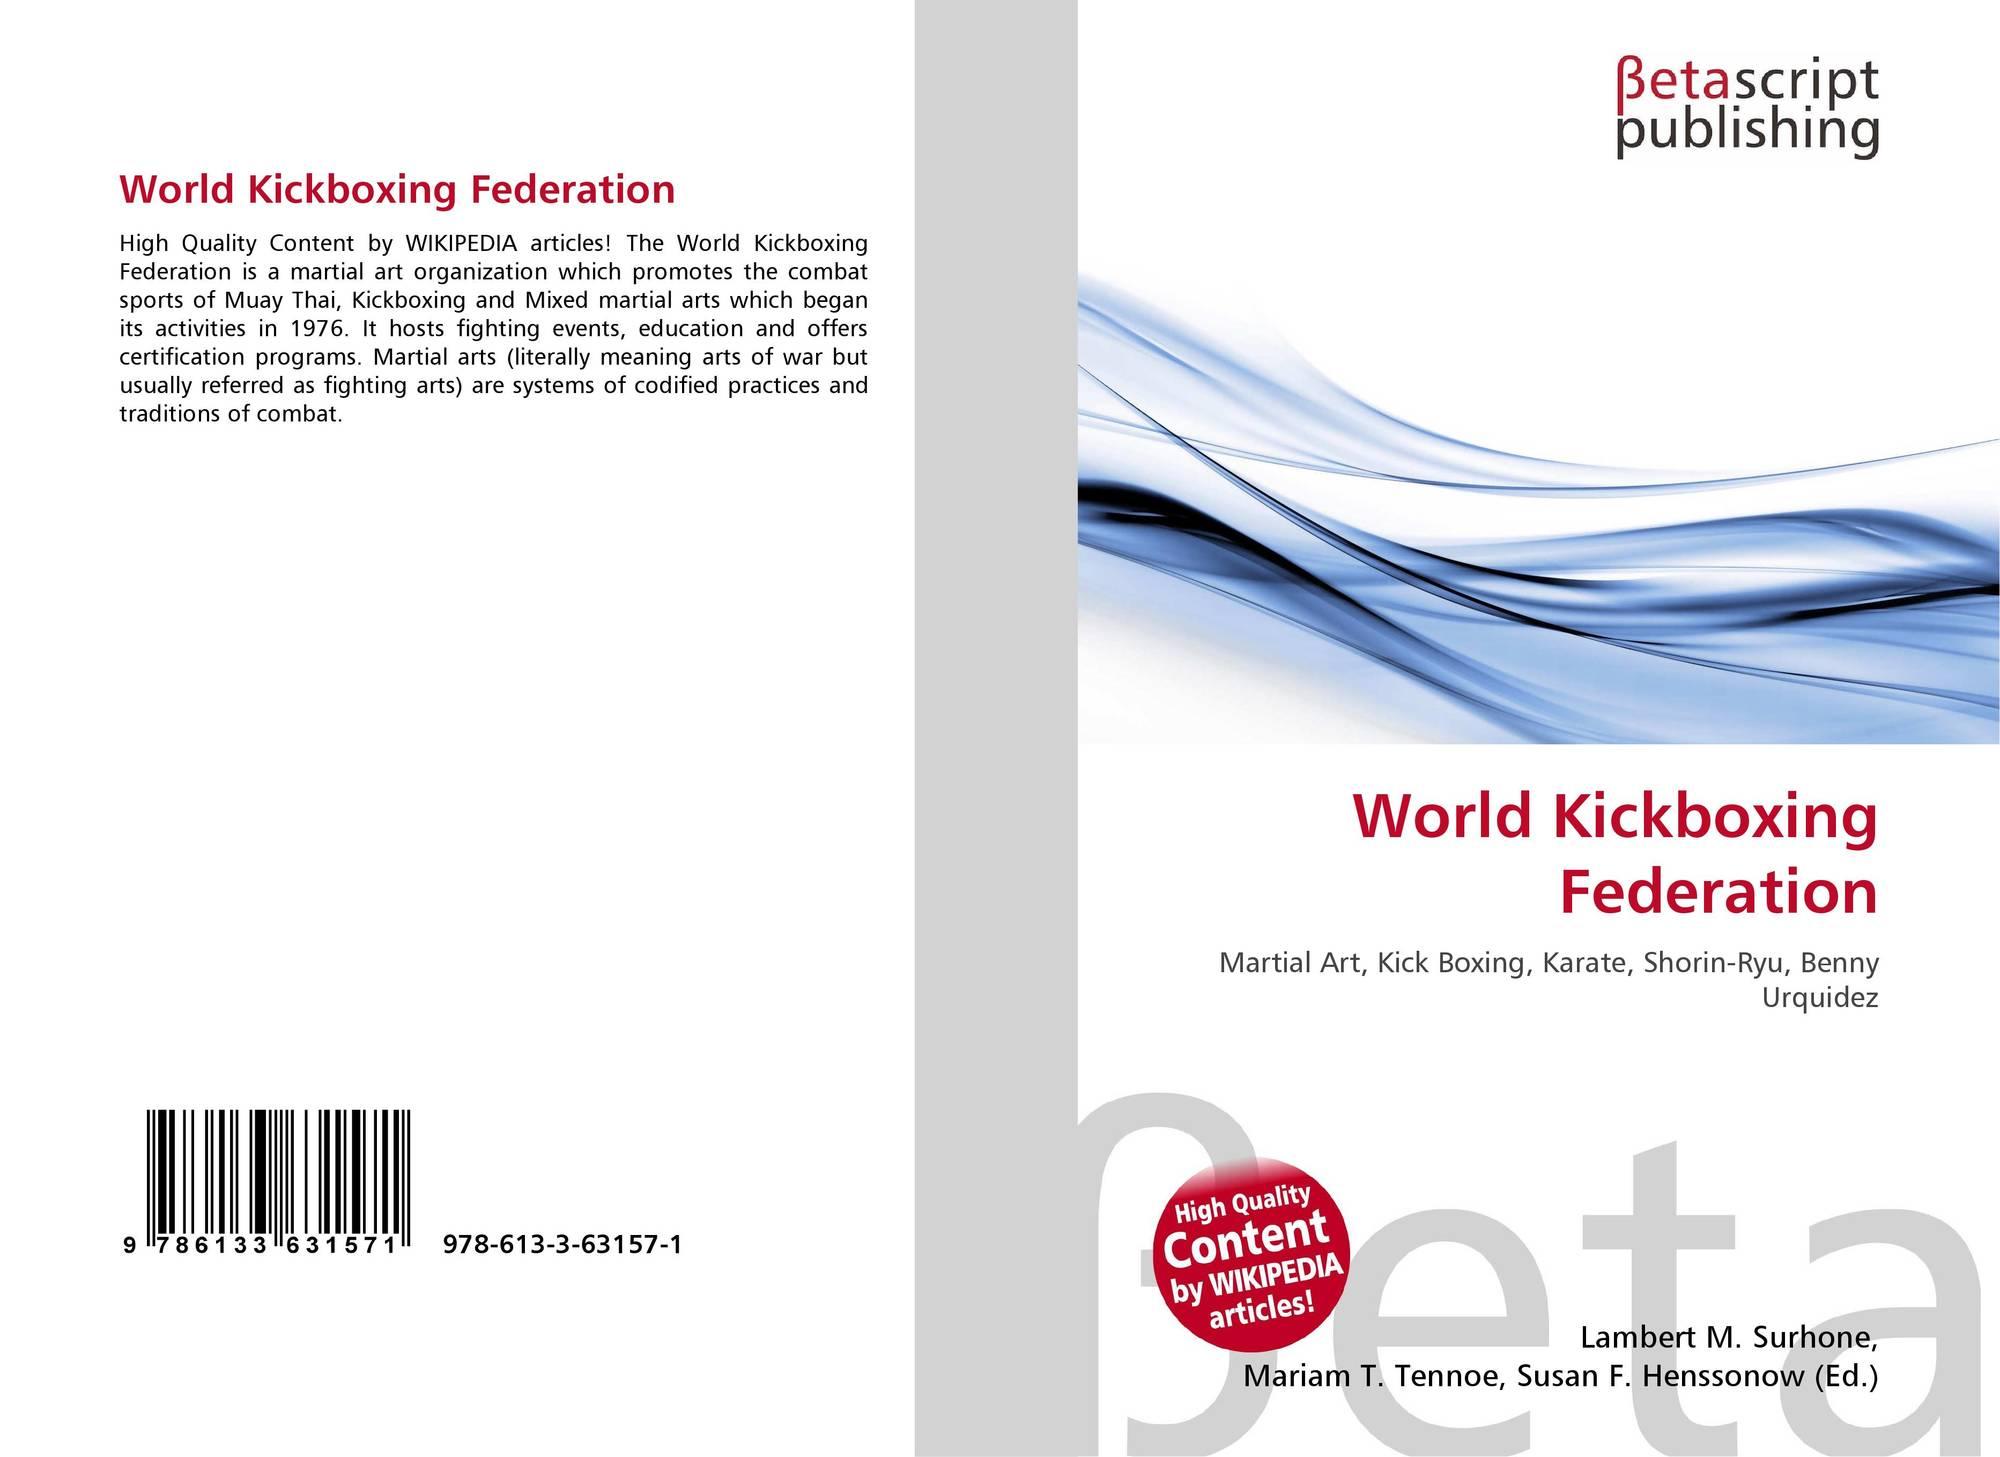 World Kickboxing Federation 978 613 3 63157 1 6133631570